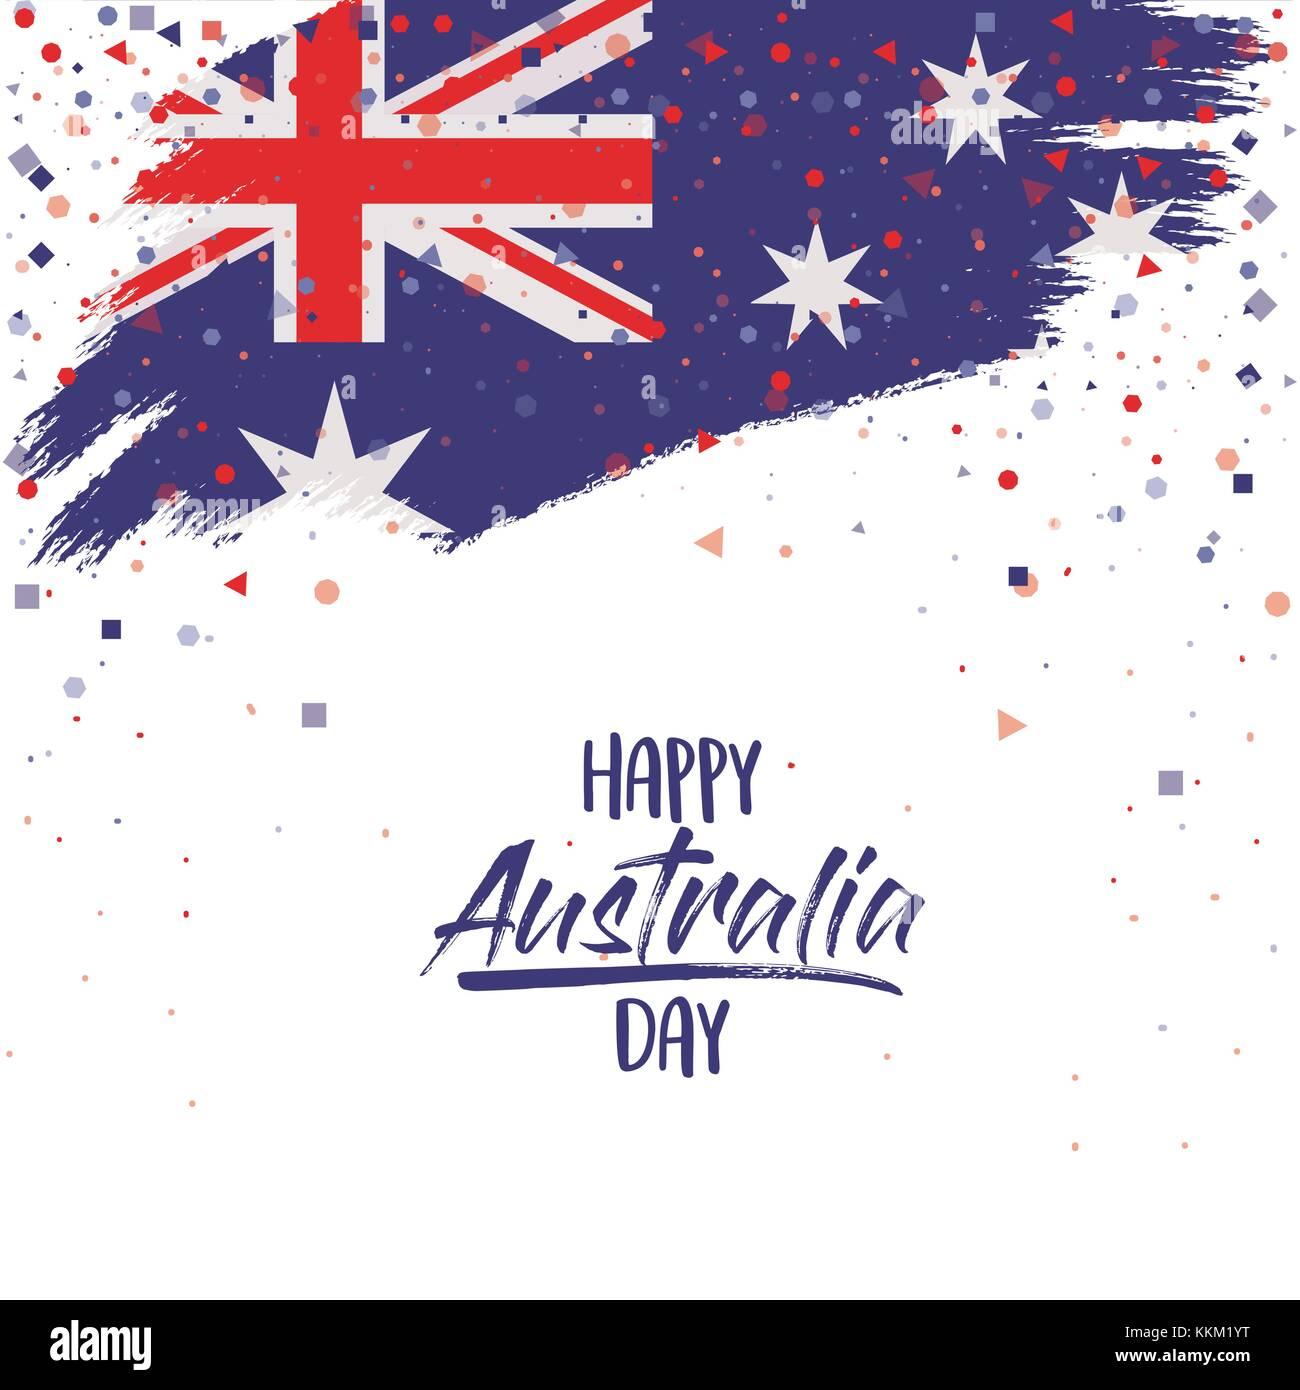 Großartig Filmplakat Rahmen Australien Bilder - Rahmen Ideen ...